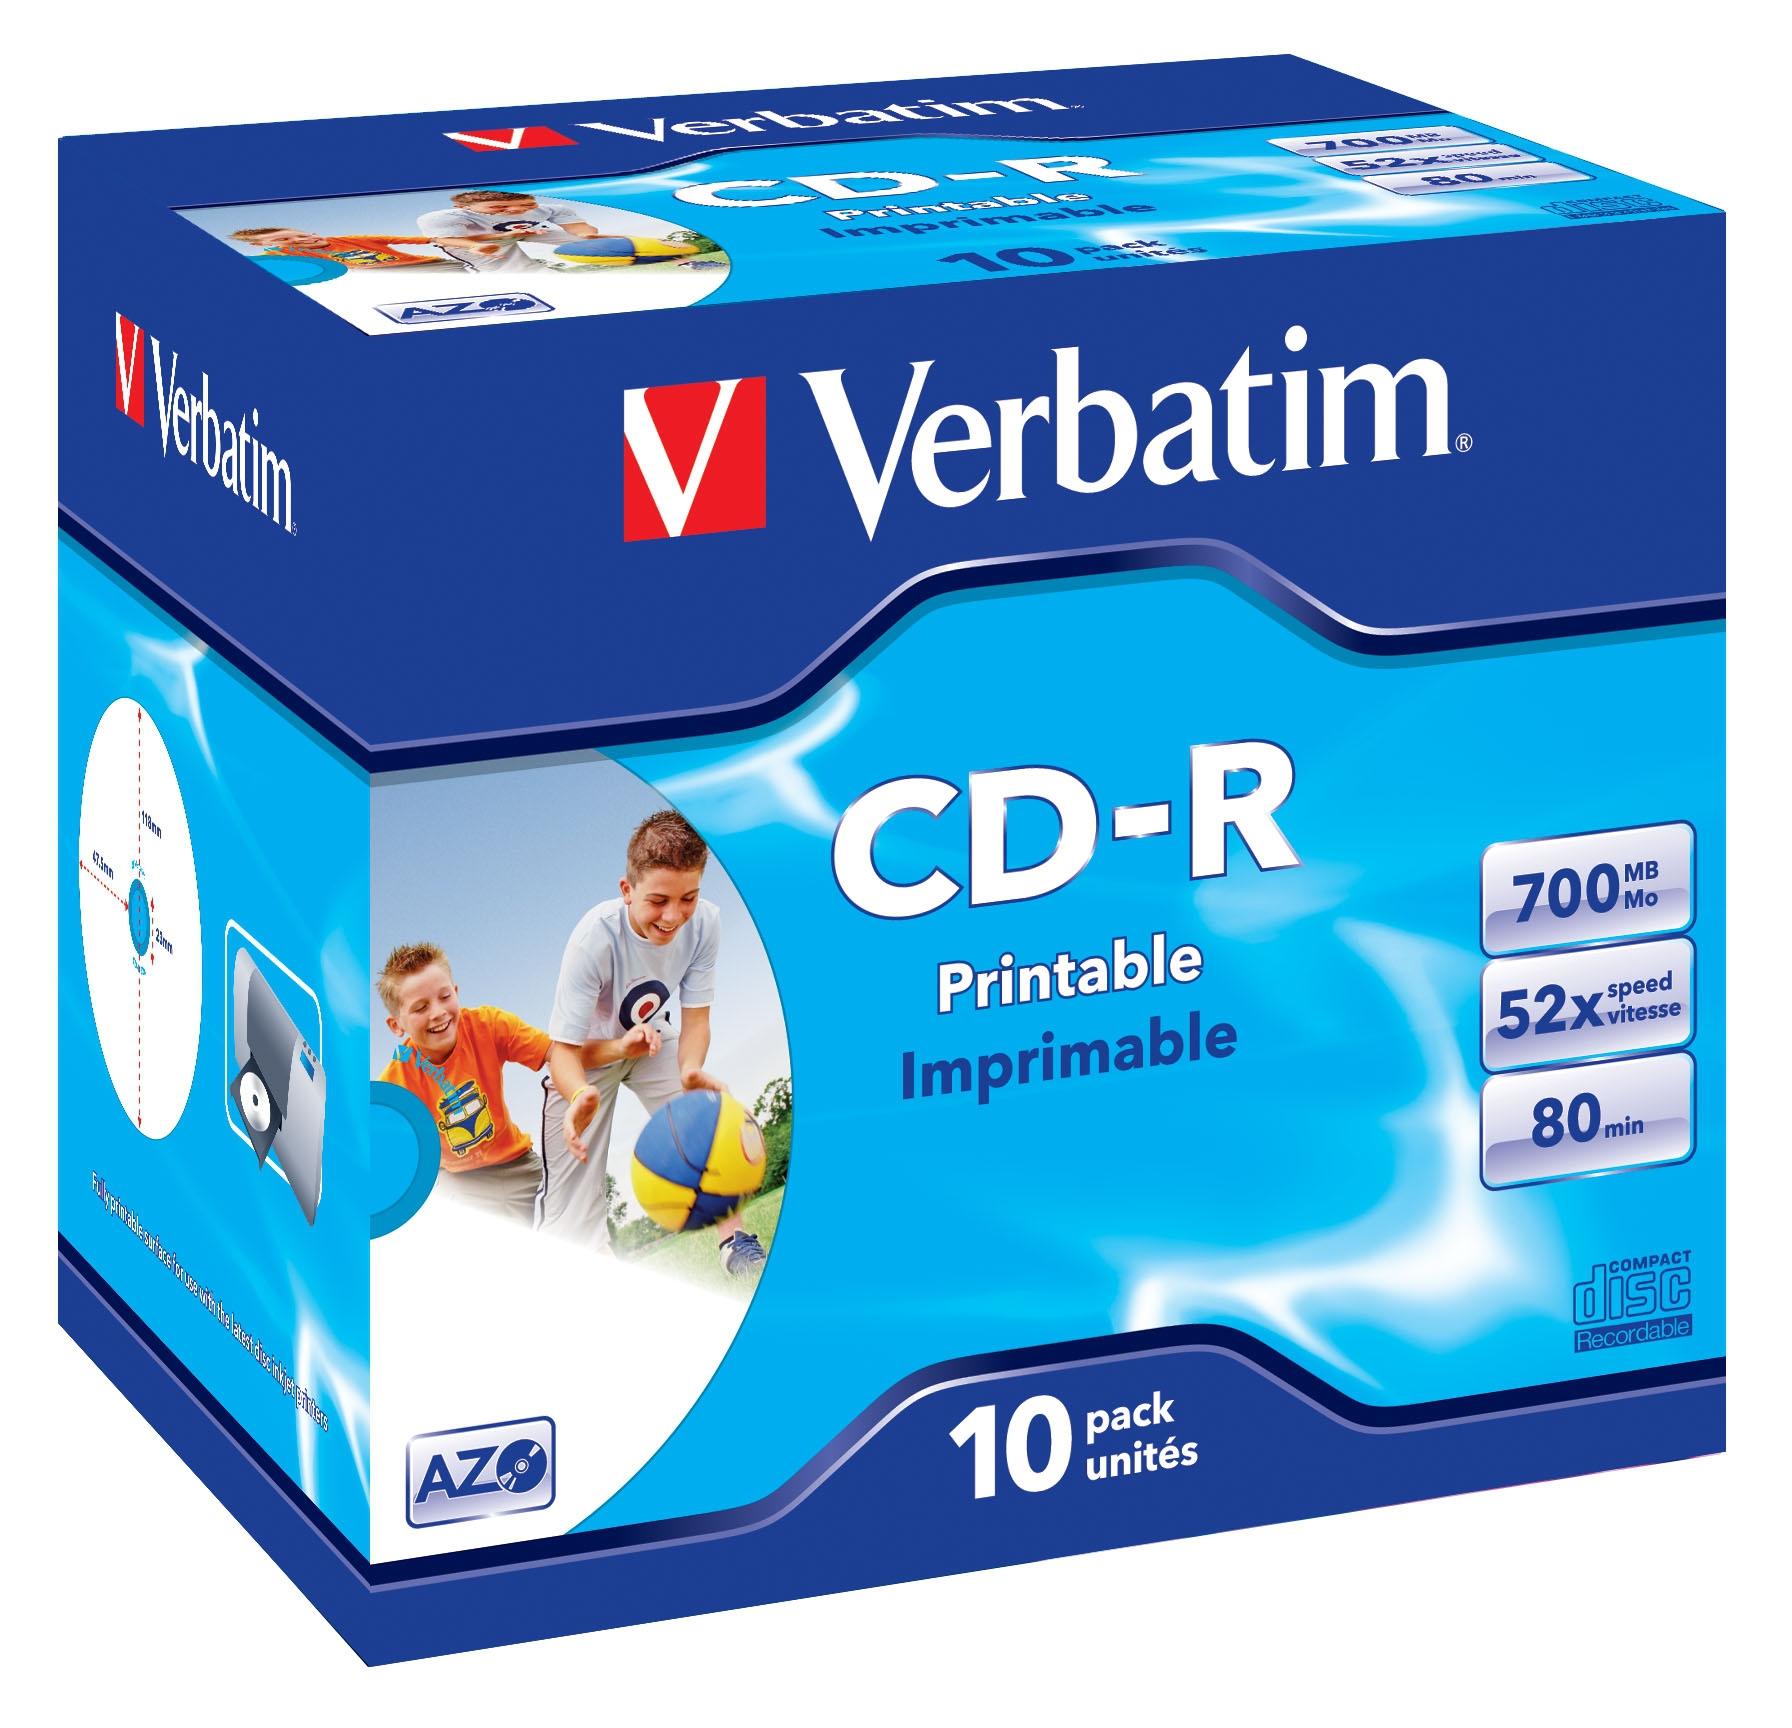 Dynamite image in verbatim cd r printable